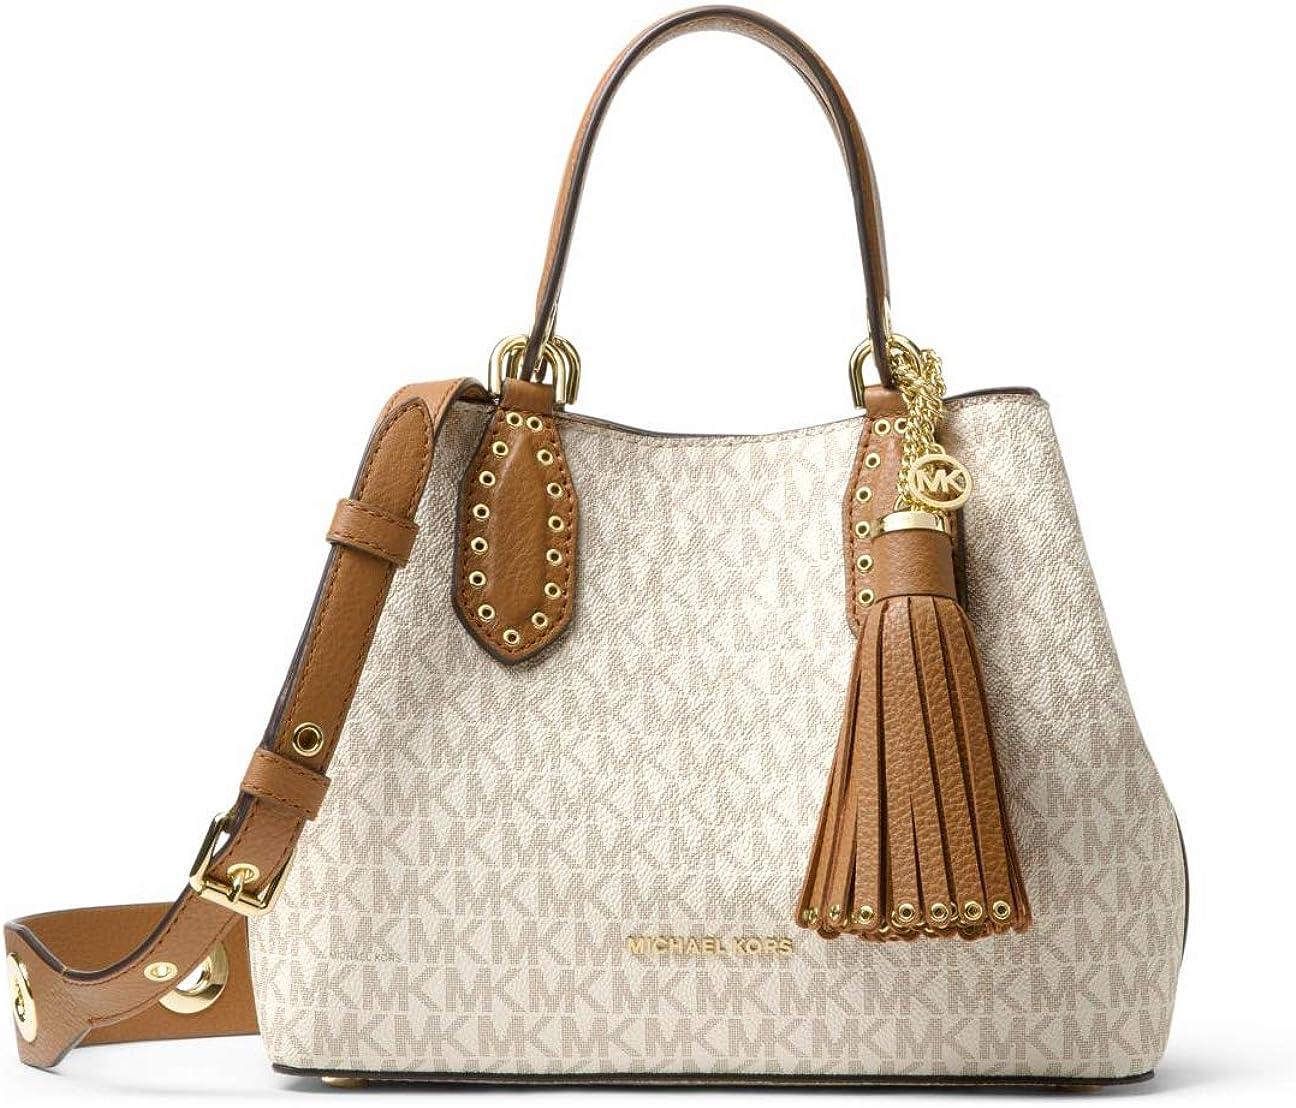 Michael Kors Brooklyn Small Logo Grab Bag Crossbody Satchel - Vanilla